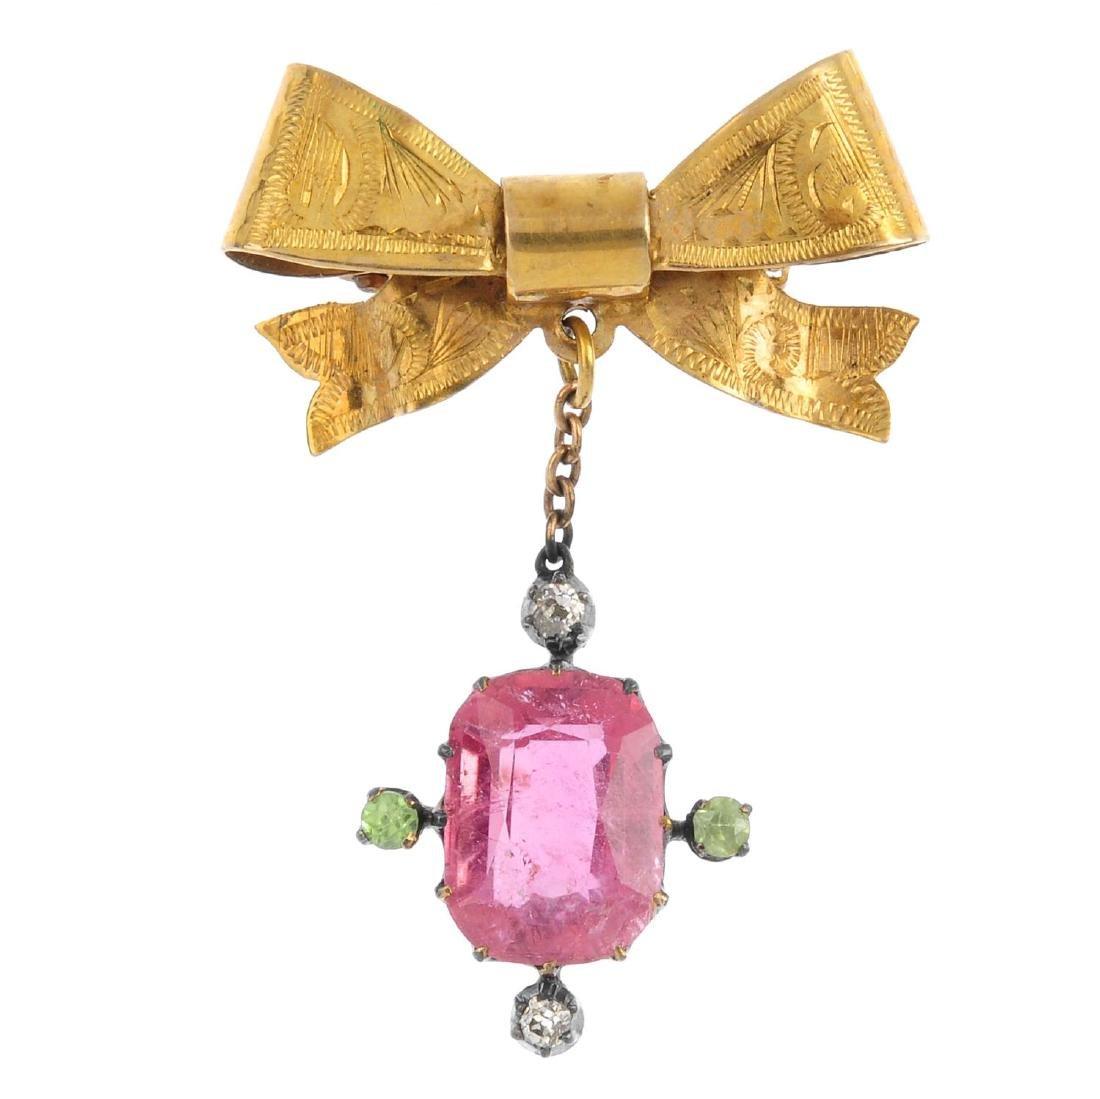 A gem-set brooch. The early 20th century cushion-shape